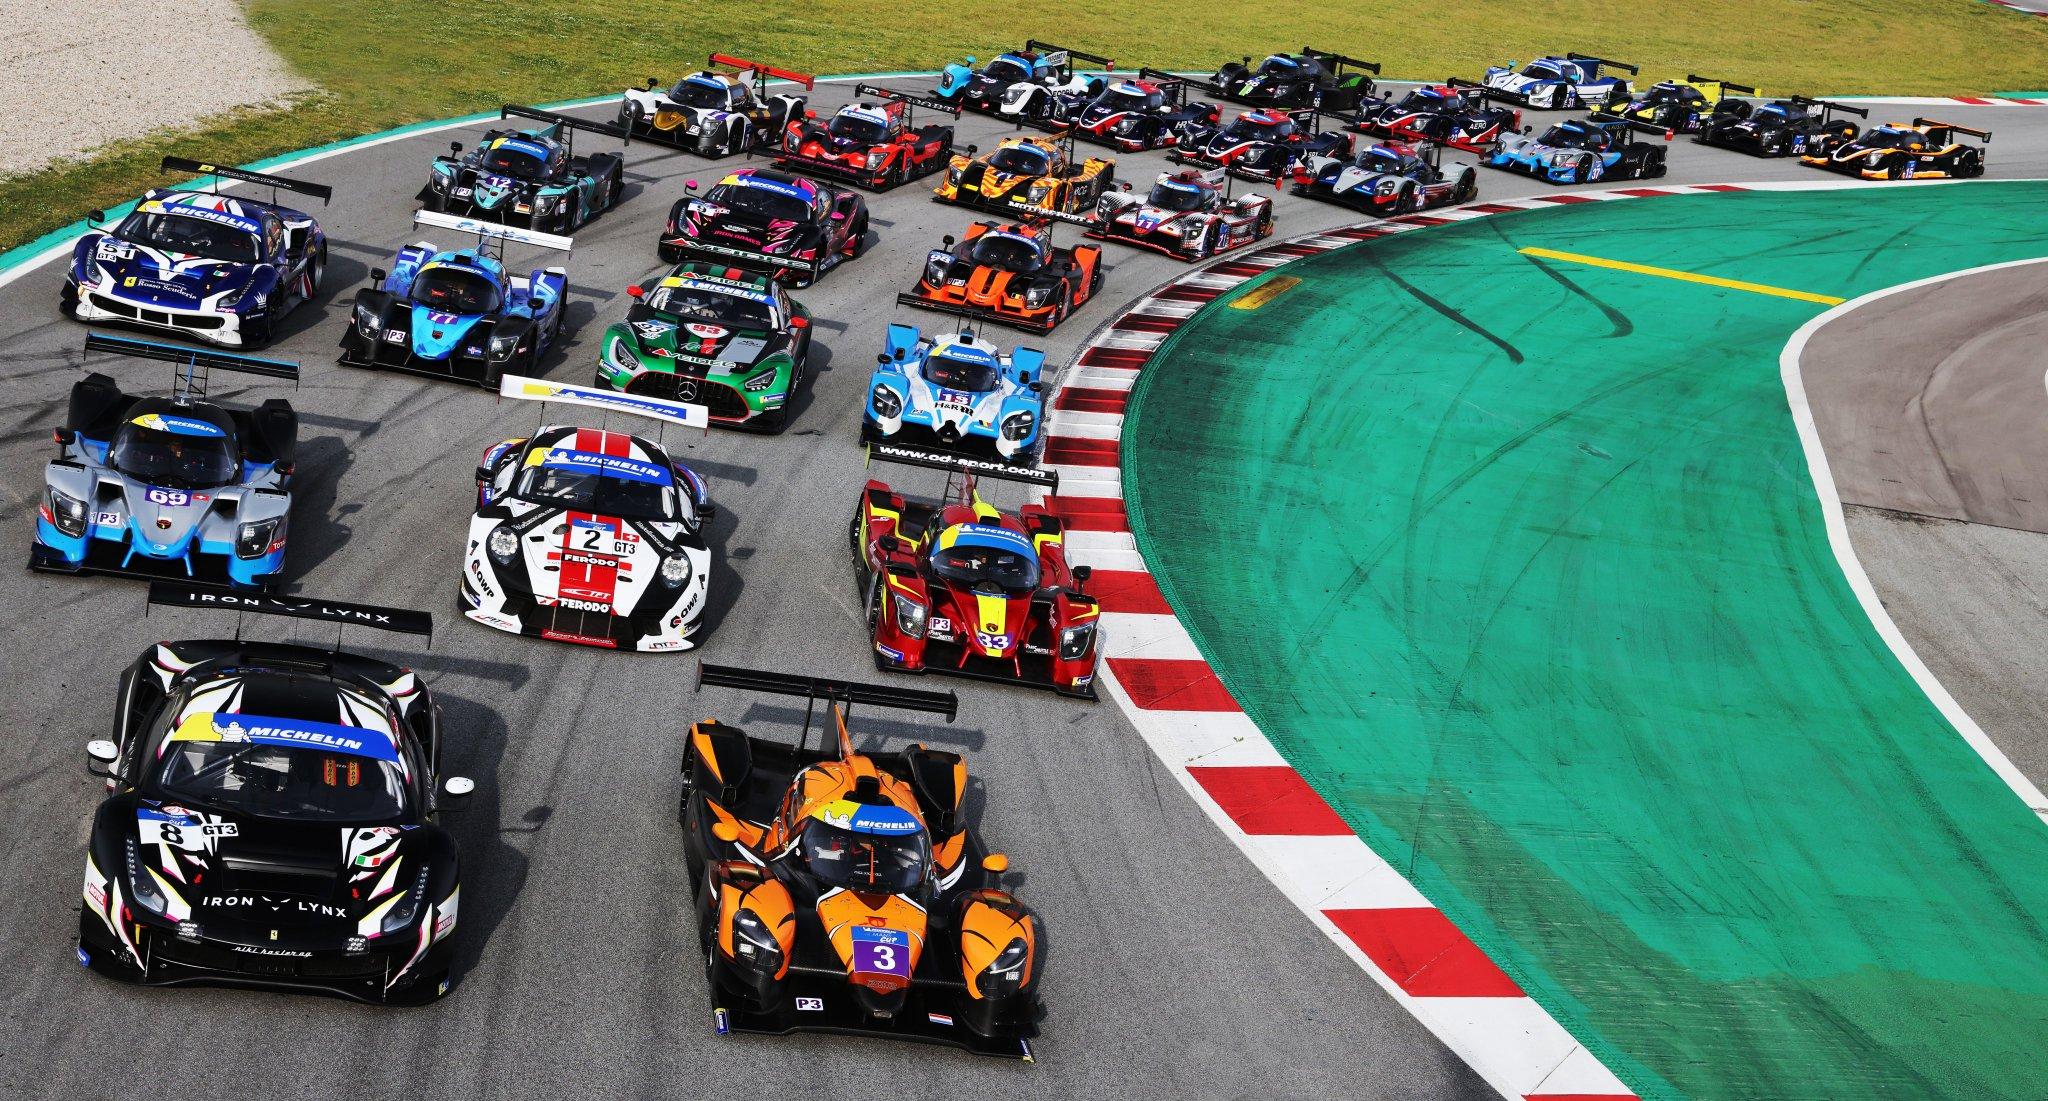 Michelin Le Mans Cup 2021: Preview